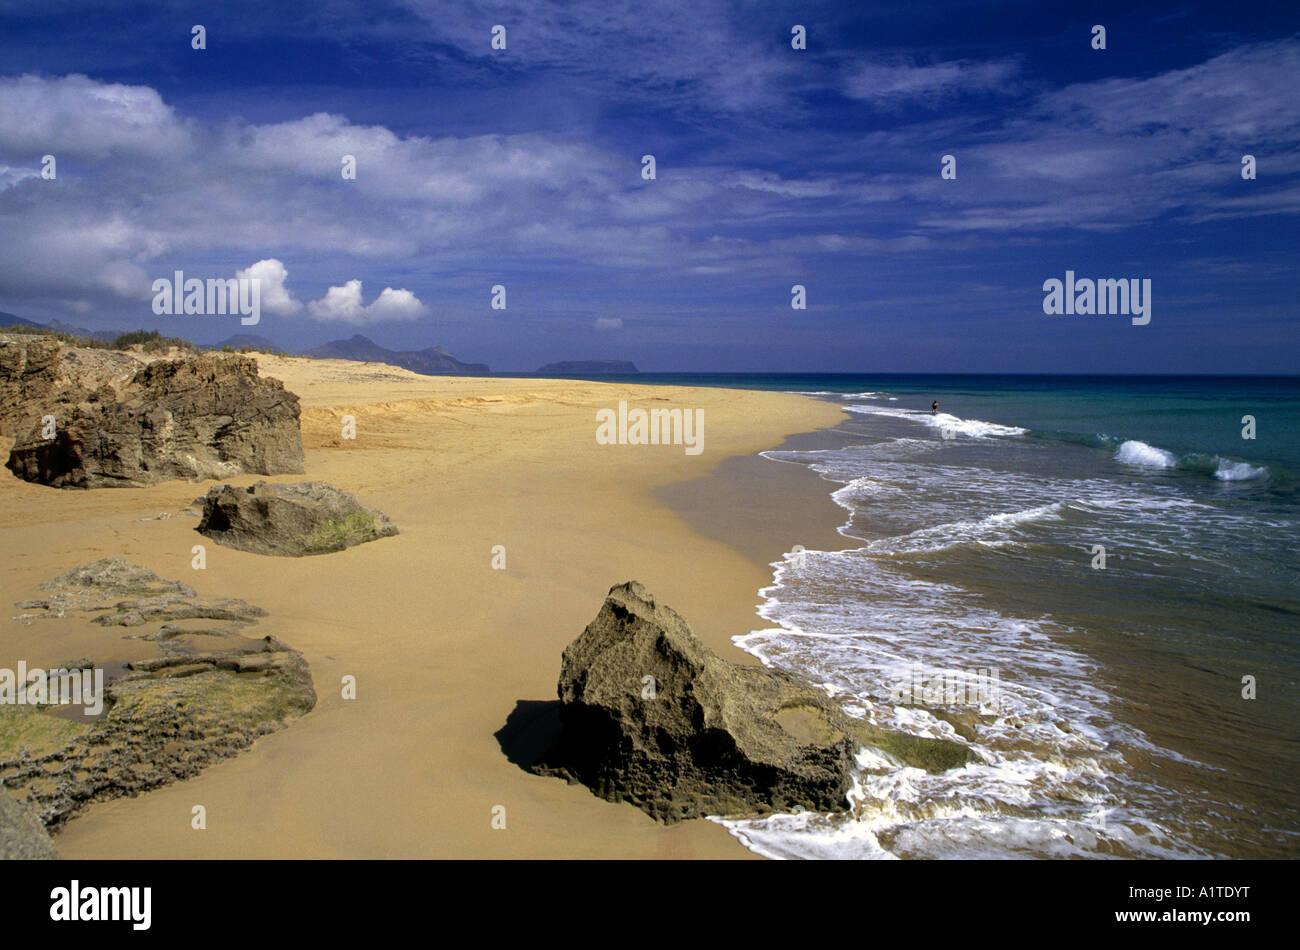 coastline and beach of praia de porto santo region of algarve portugal - Stock Image